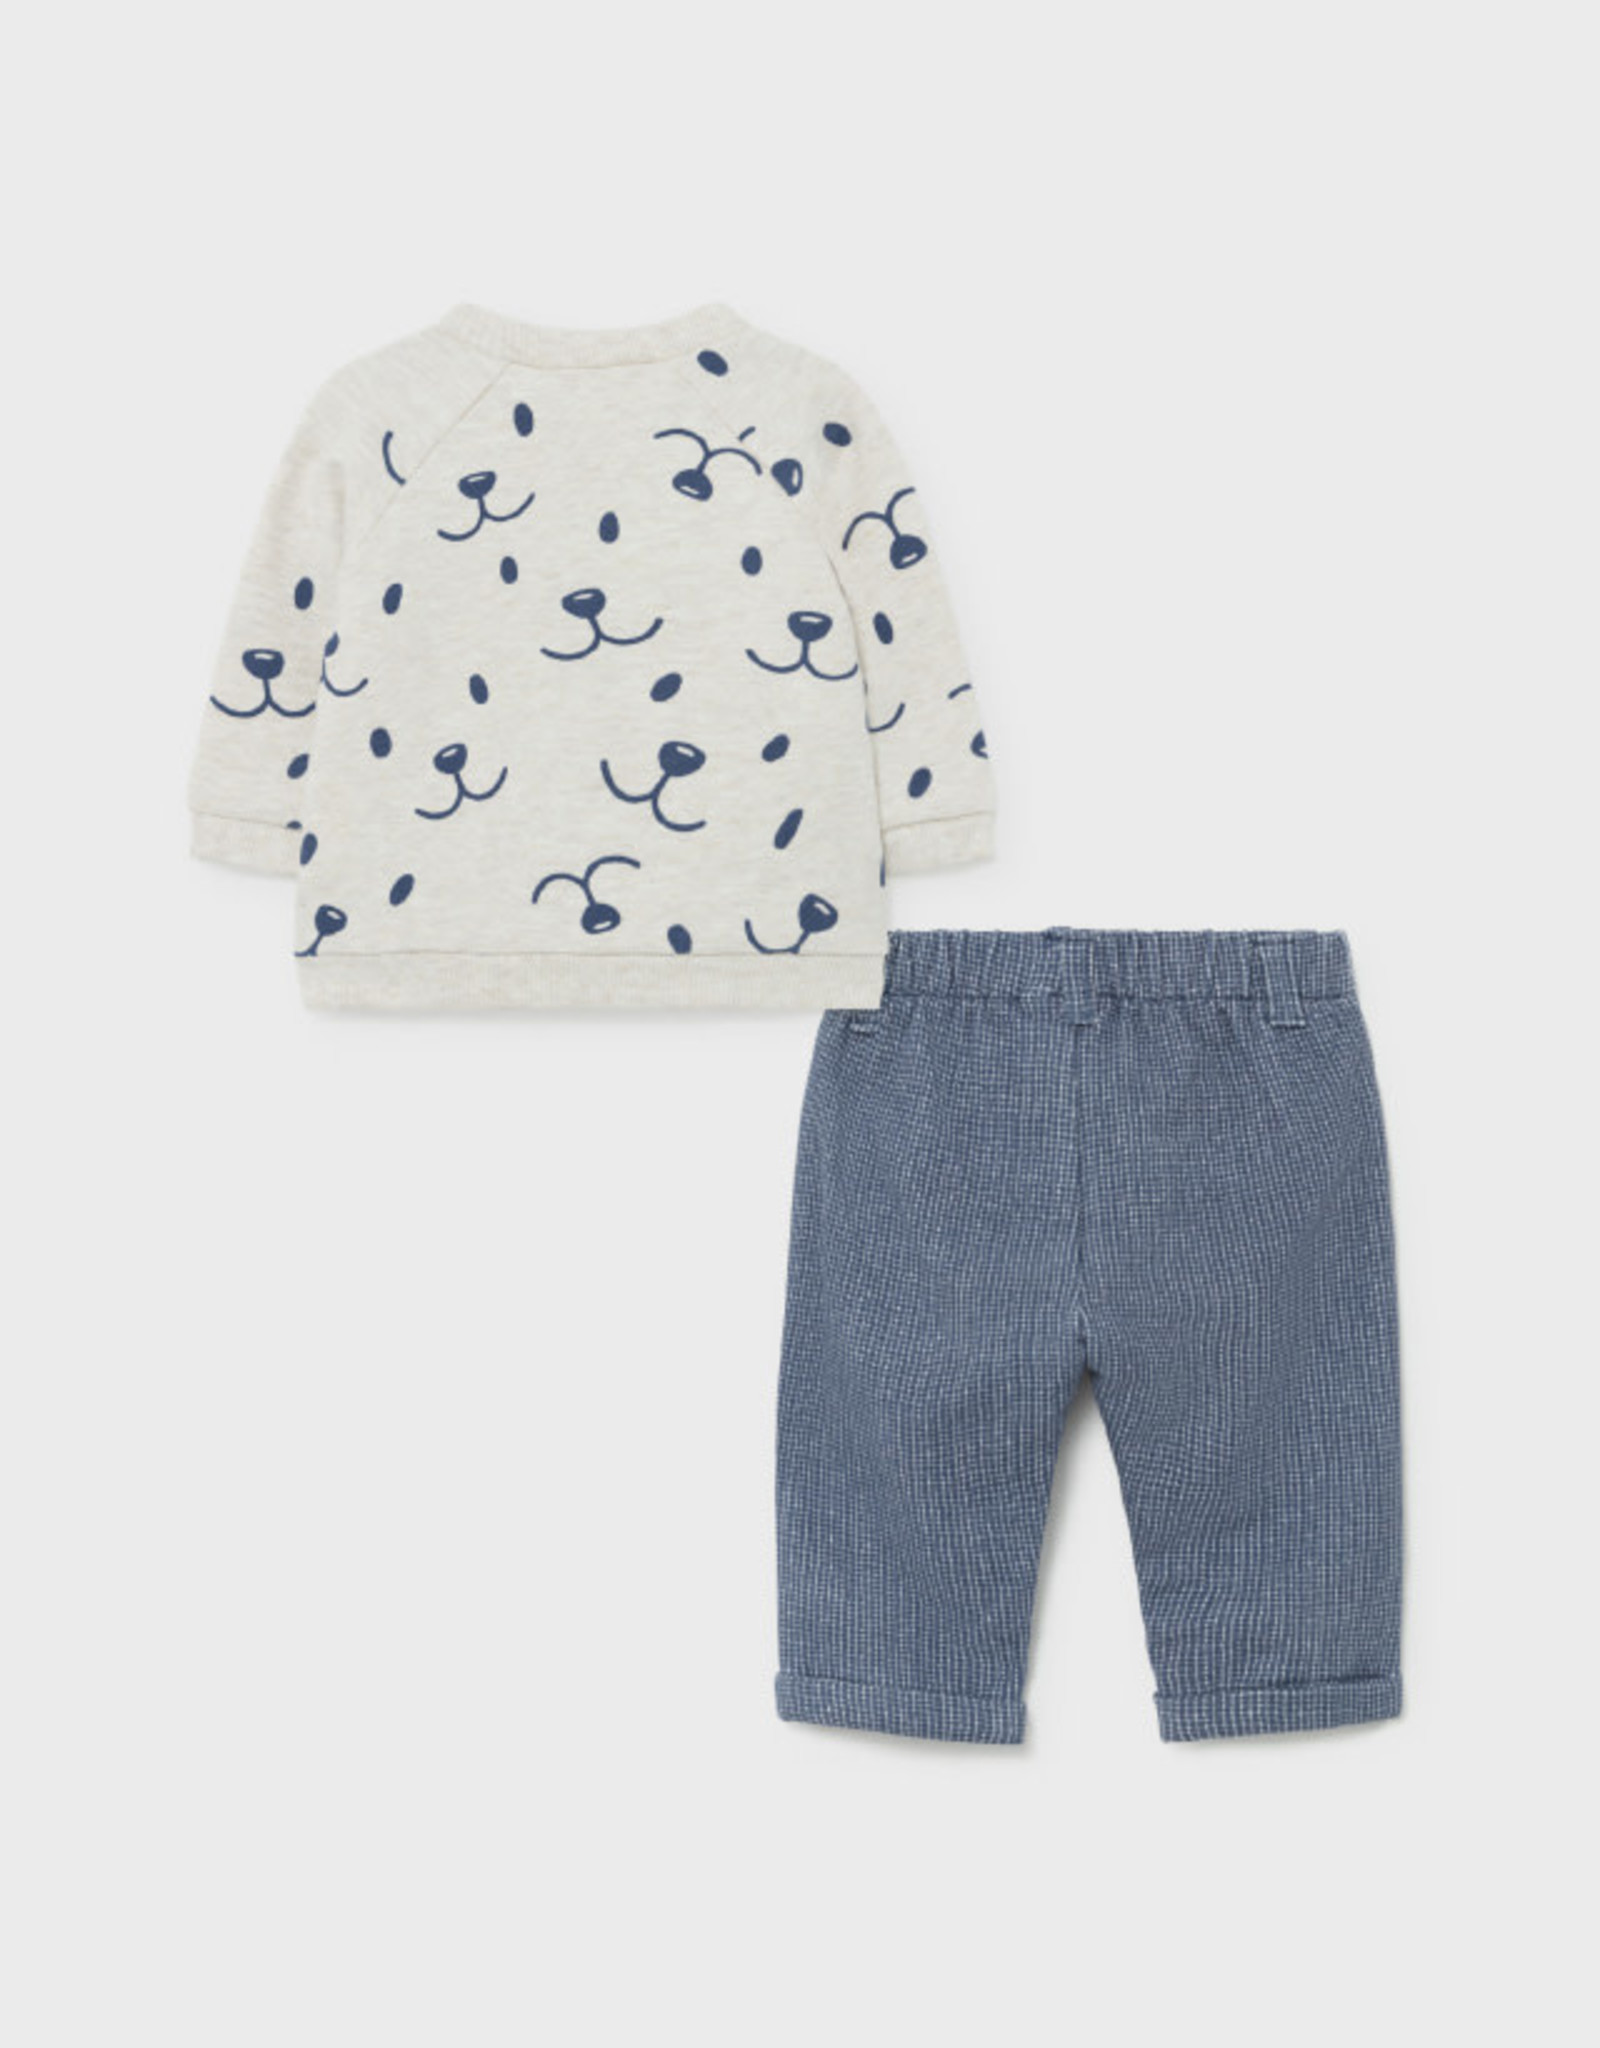 Mayoral Sweatshirt & Pants Set - Navy/Tan